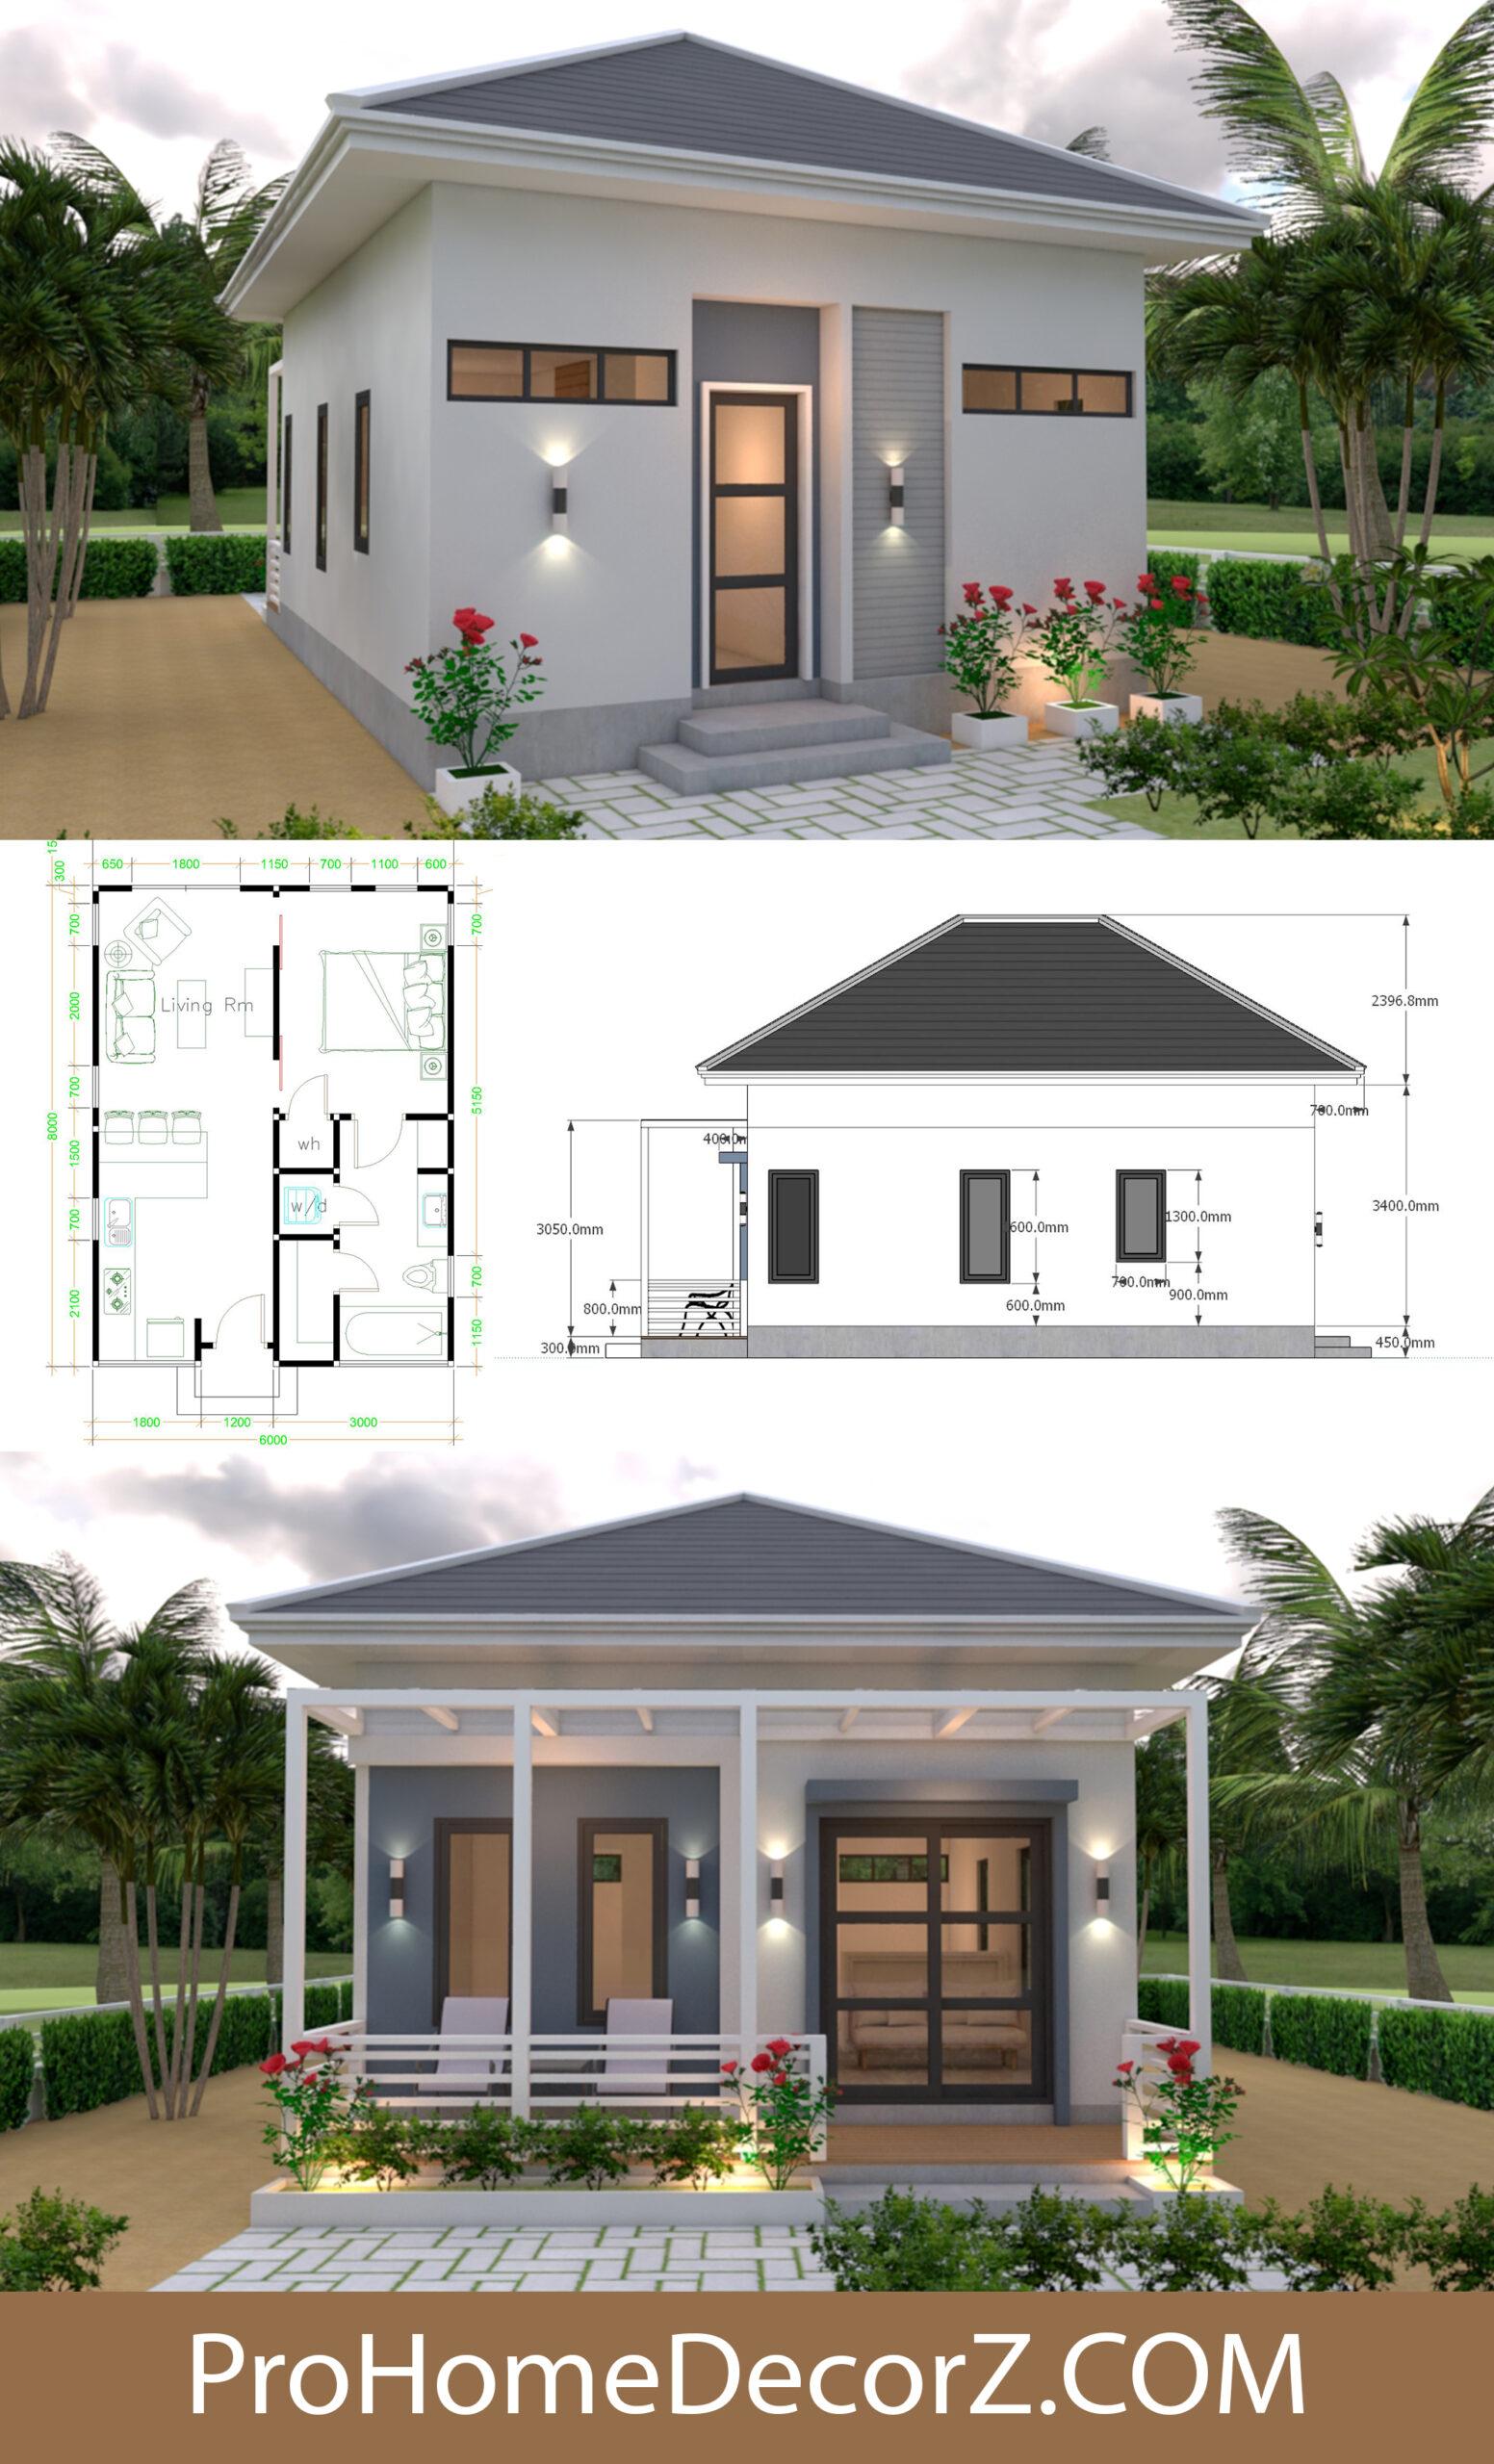 Hip roof Beautiful Studio House 6x8 with Floor Plans